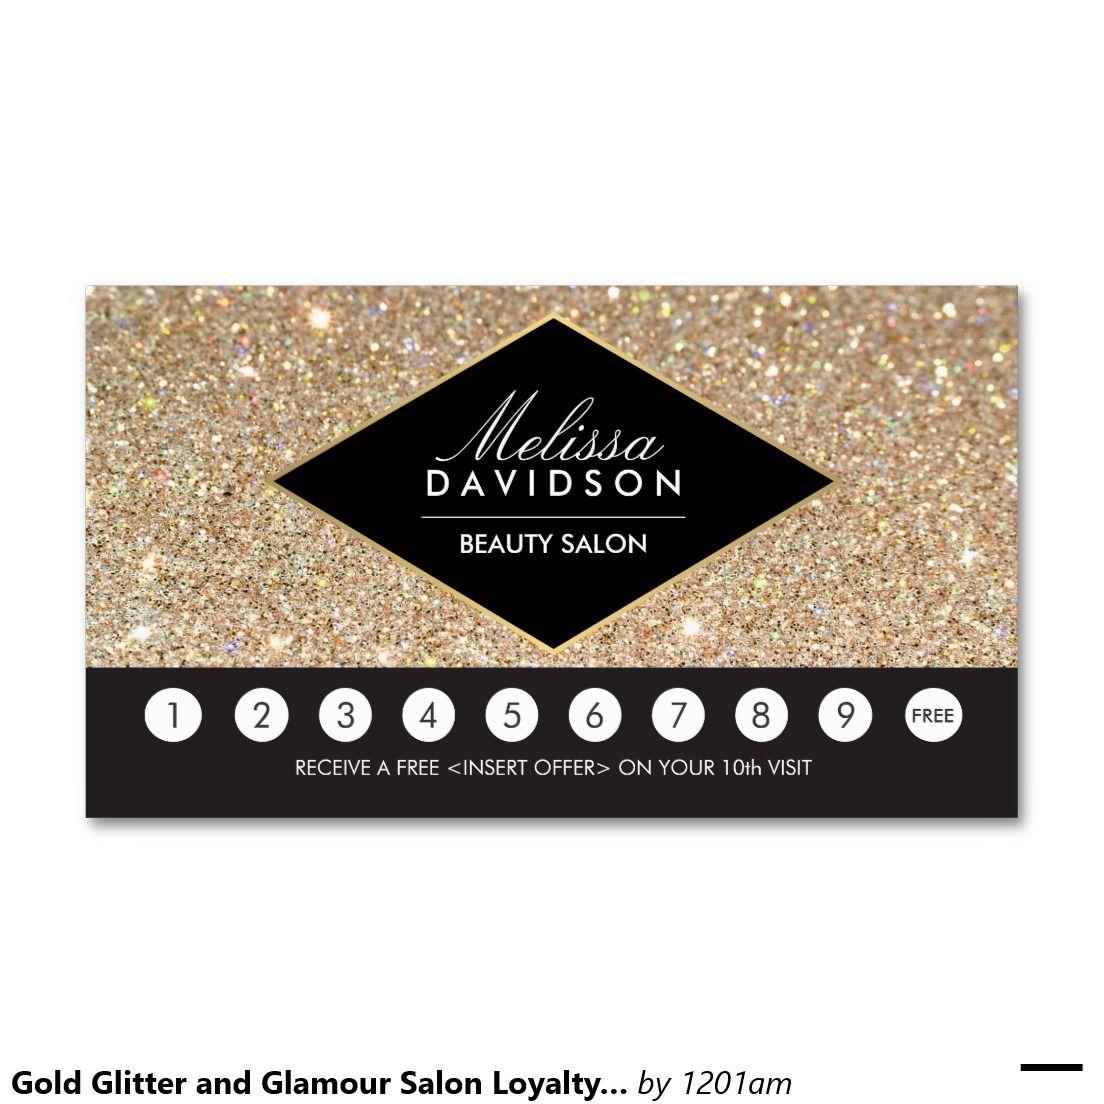 white and gold business cardsrewards cardsloyalty cards